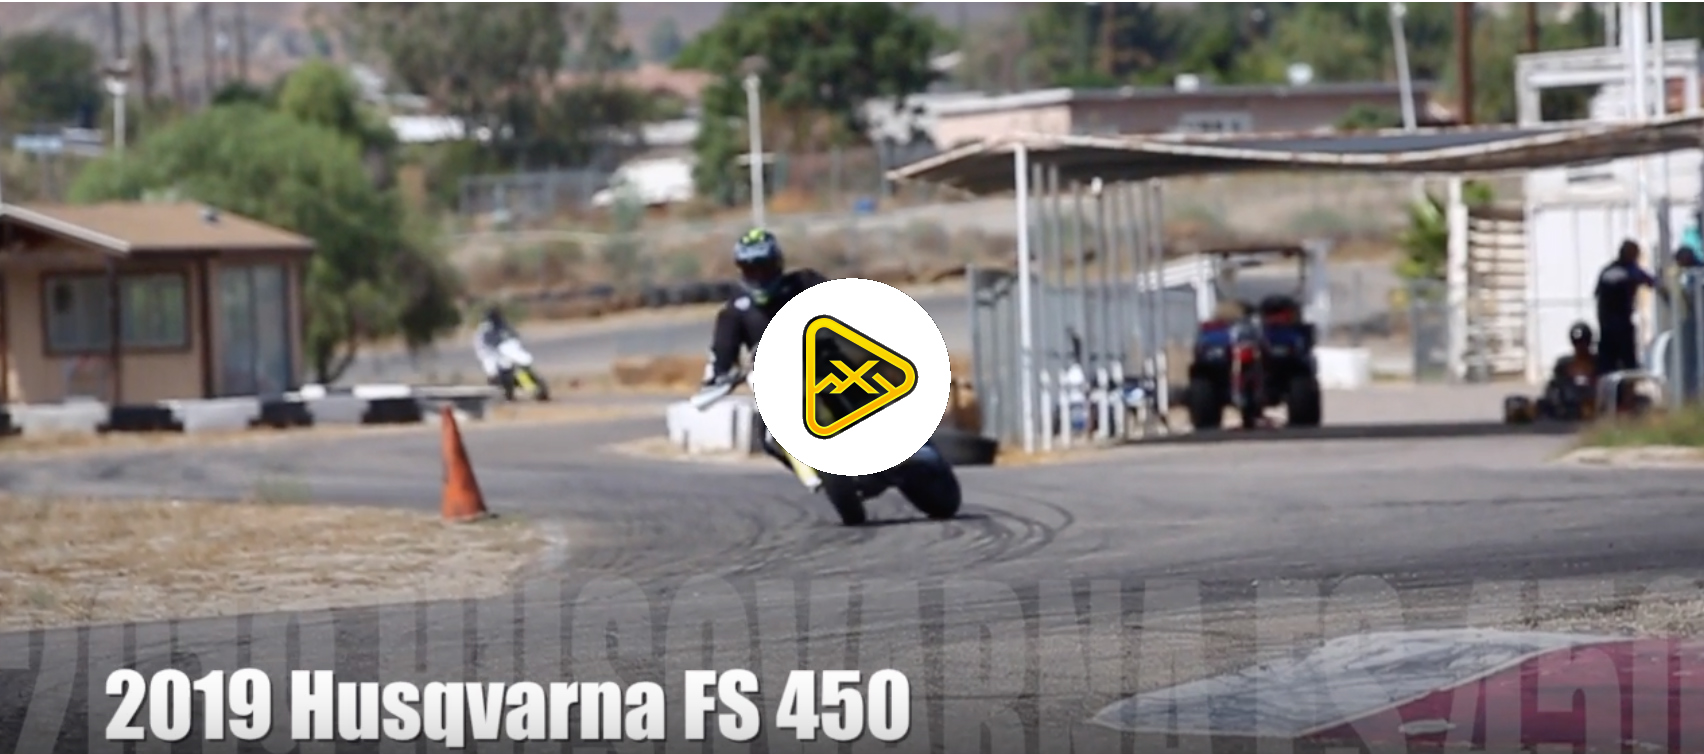 2019 Husqvarna FS450 Supermoto First Ride